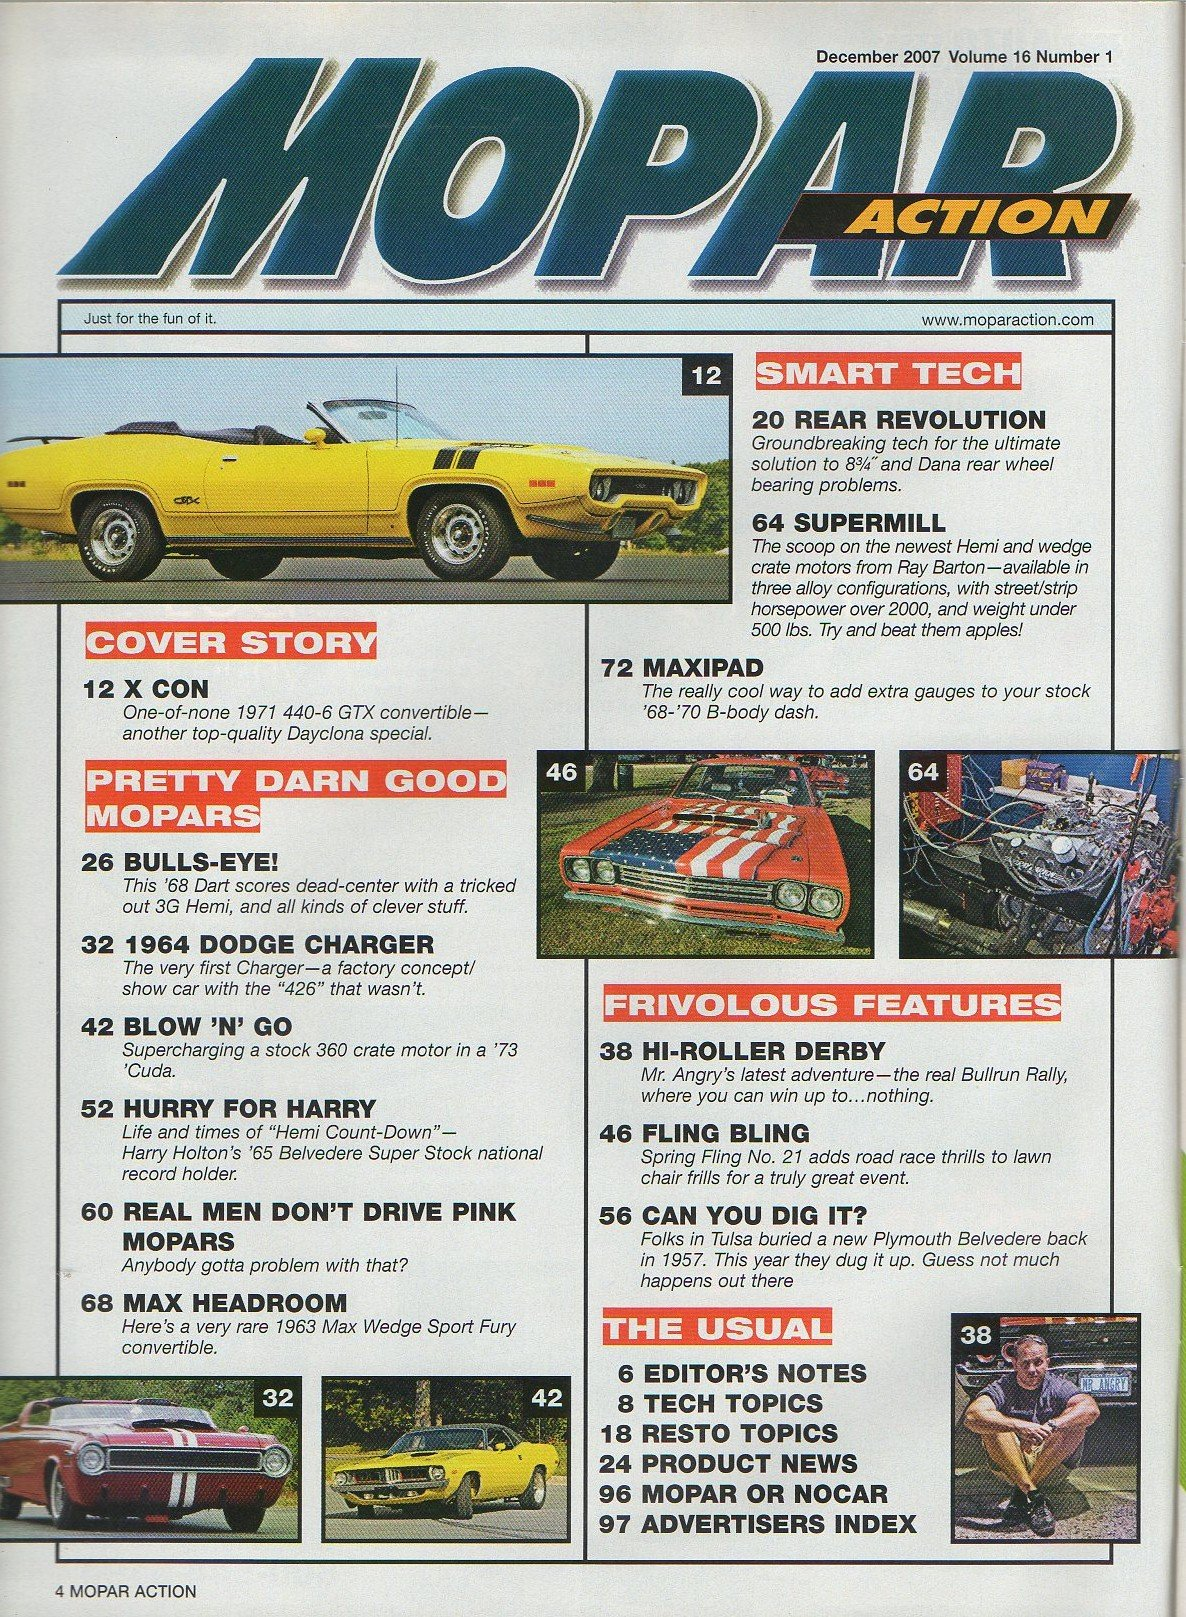 Mopar Action December 2007 Magazine SHOCKER! 1971 GTX 440+6